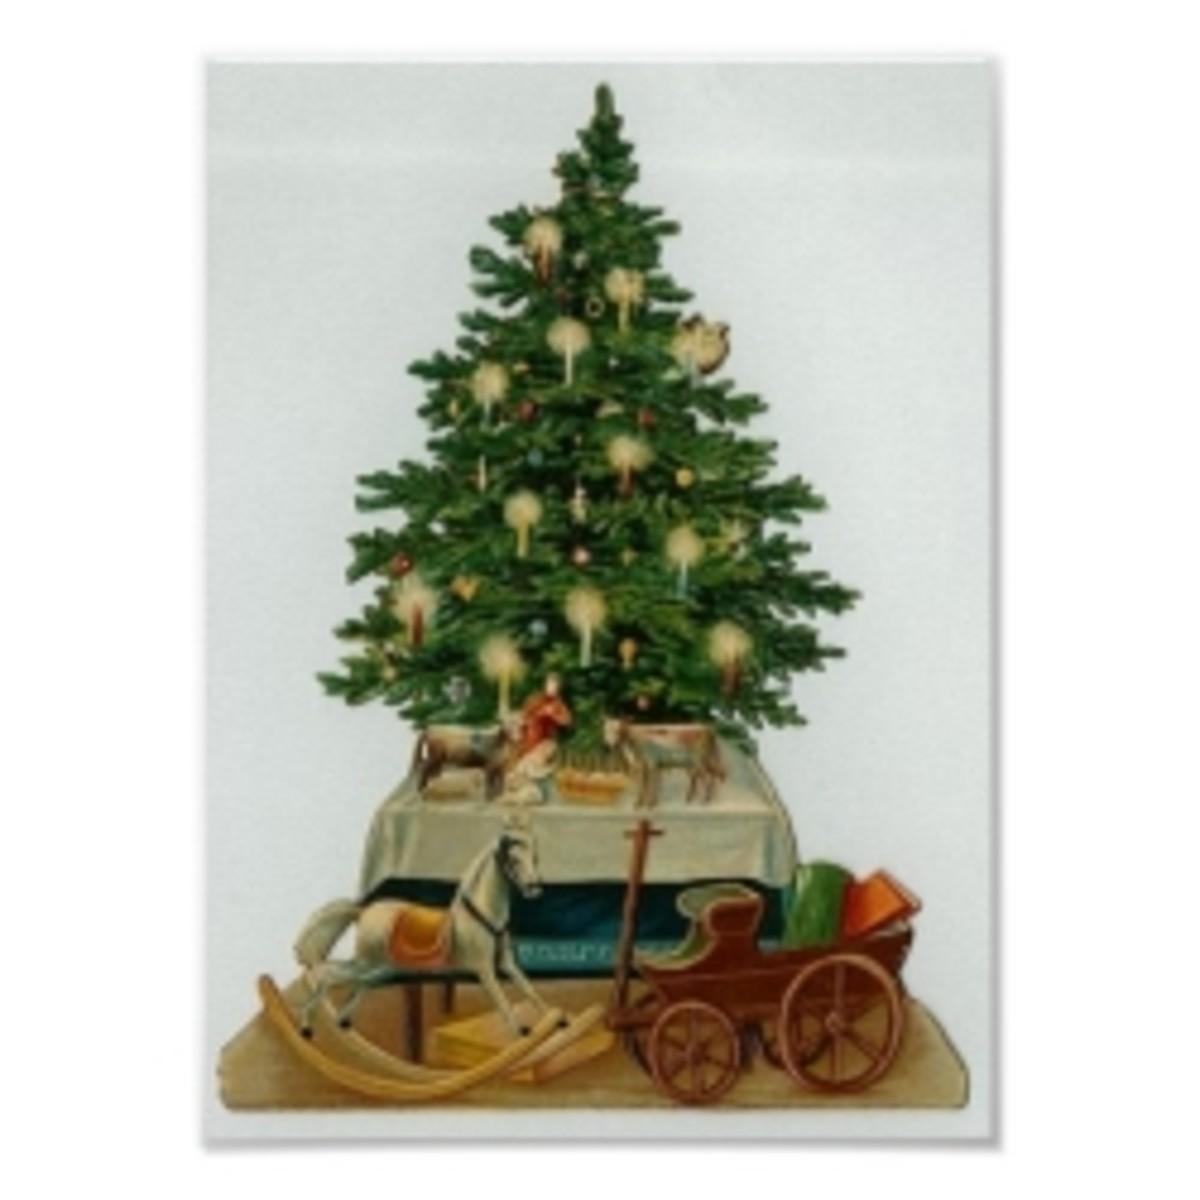 A modest Christmas tree from the Civil War era.